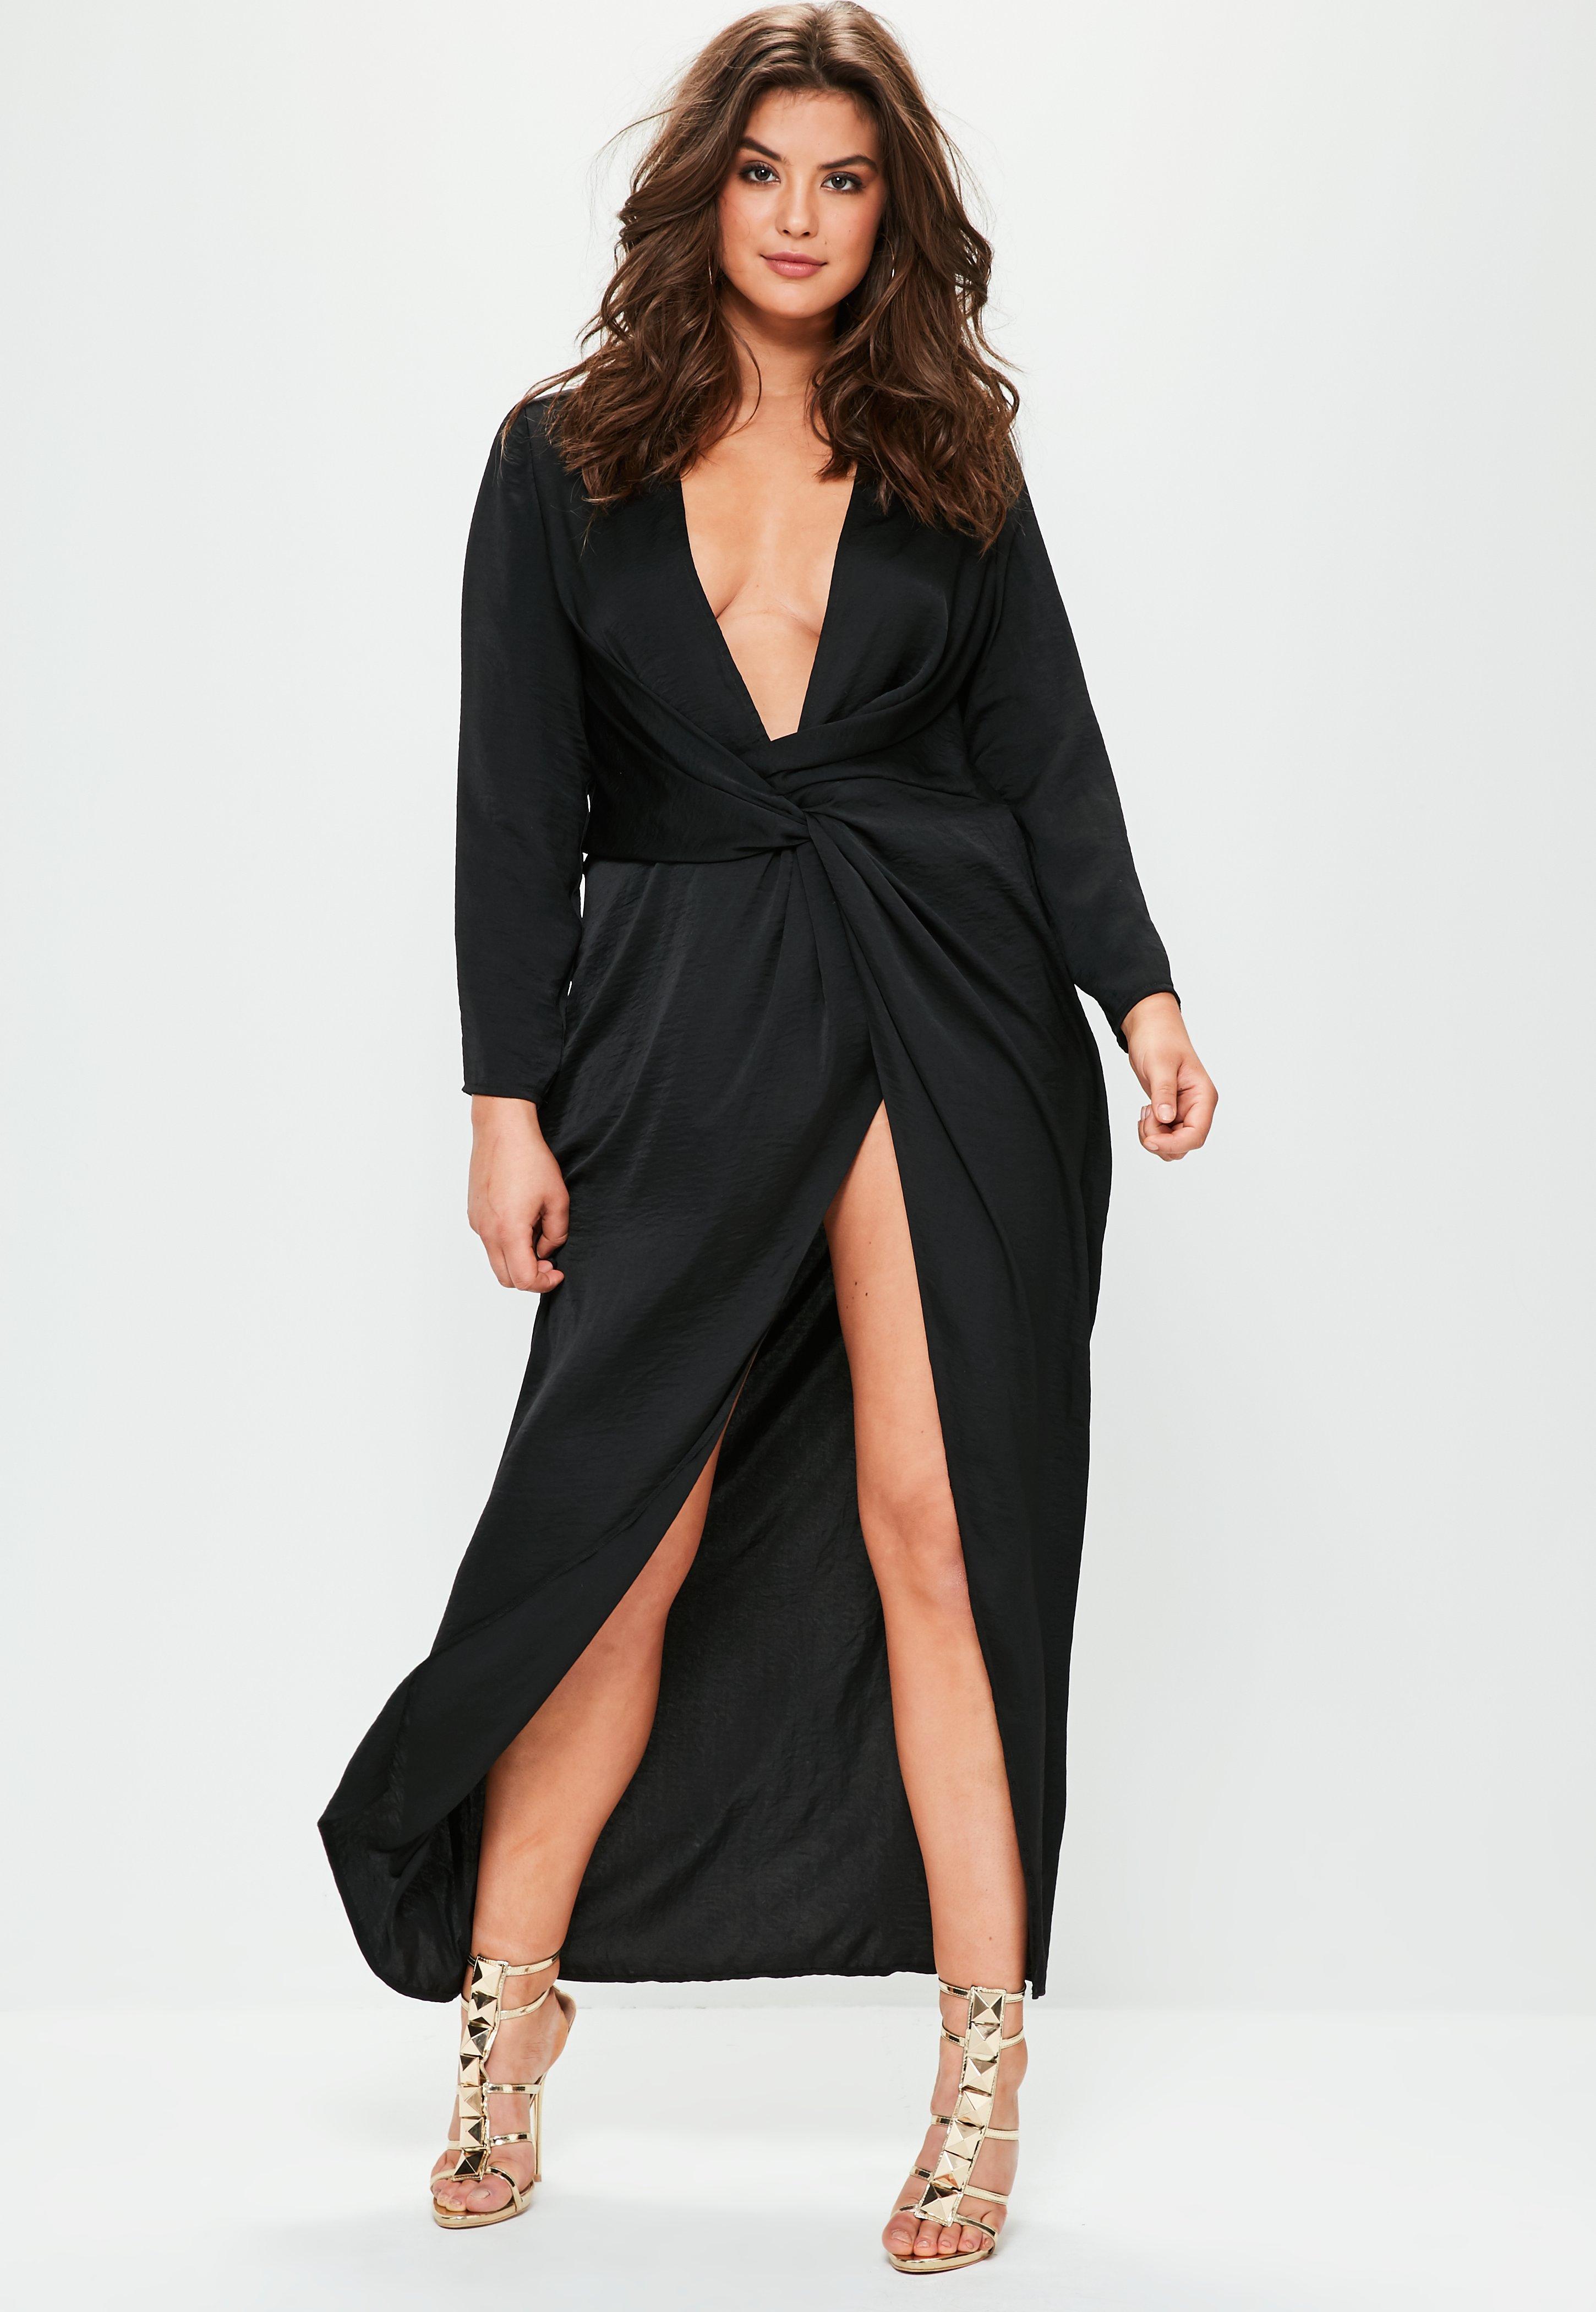 Satin maxi dress plus size